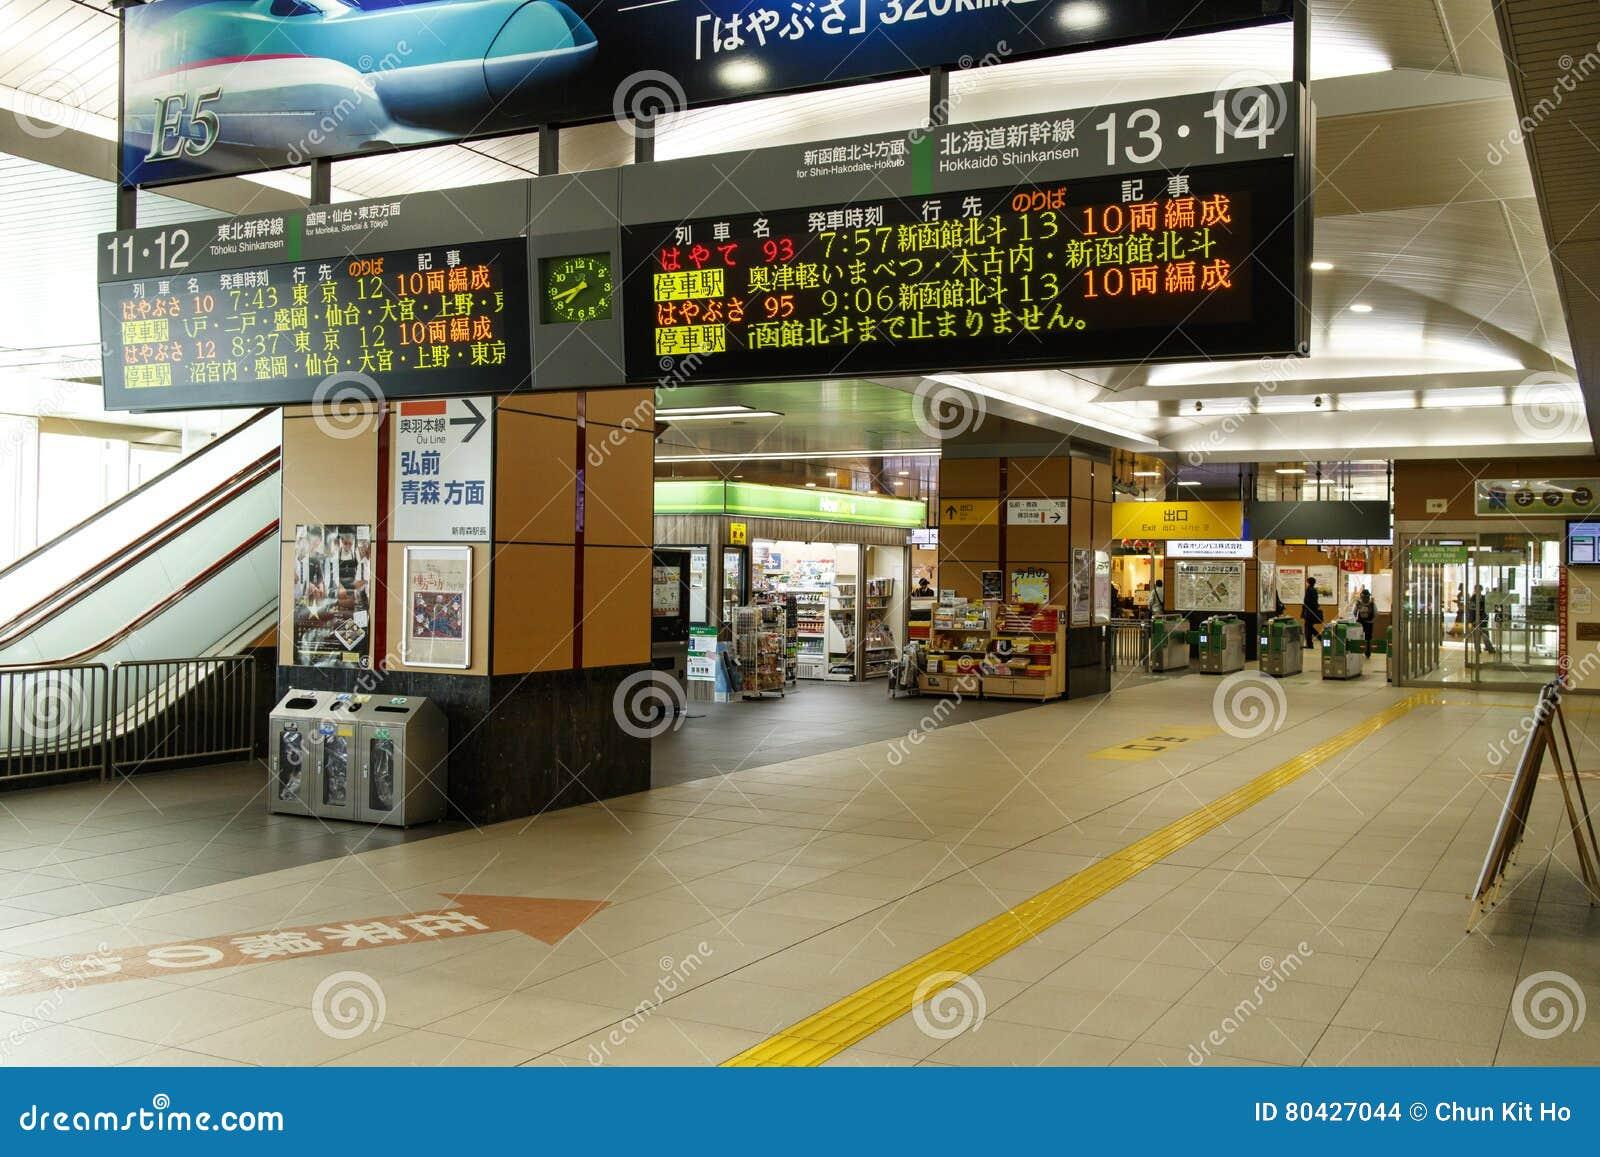 Skenben-Aomori station